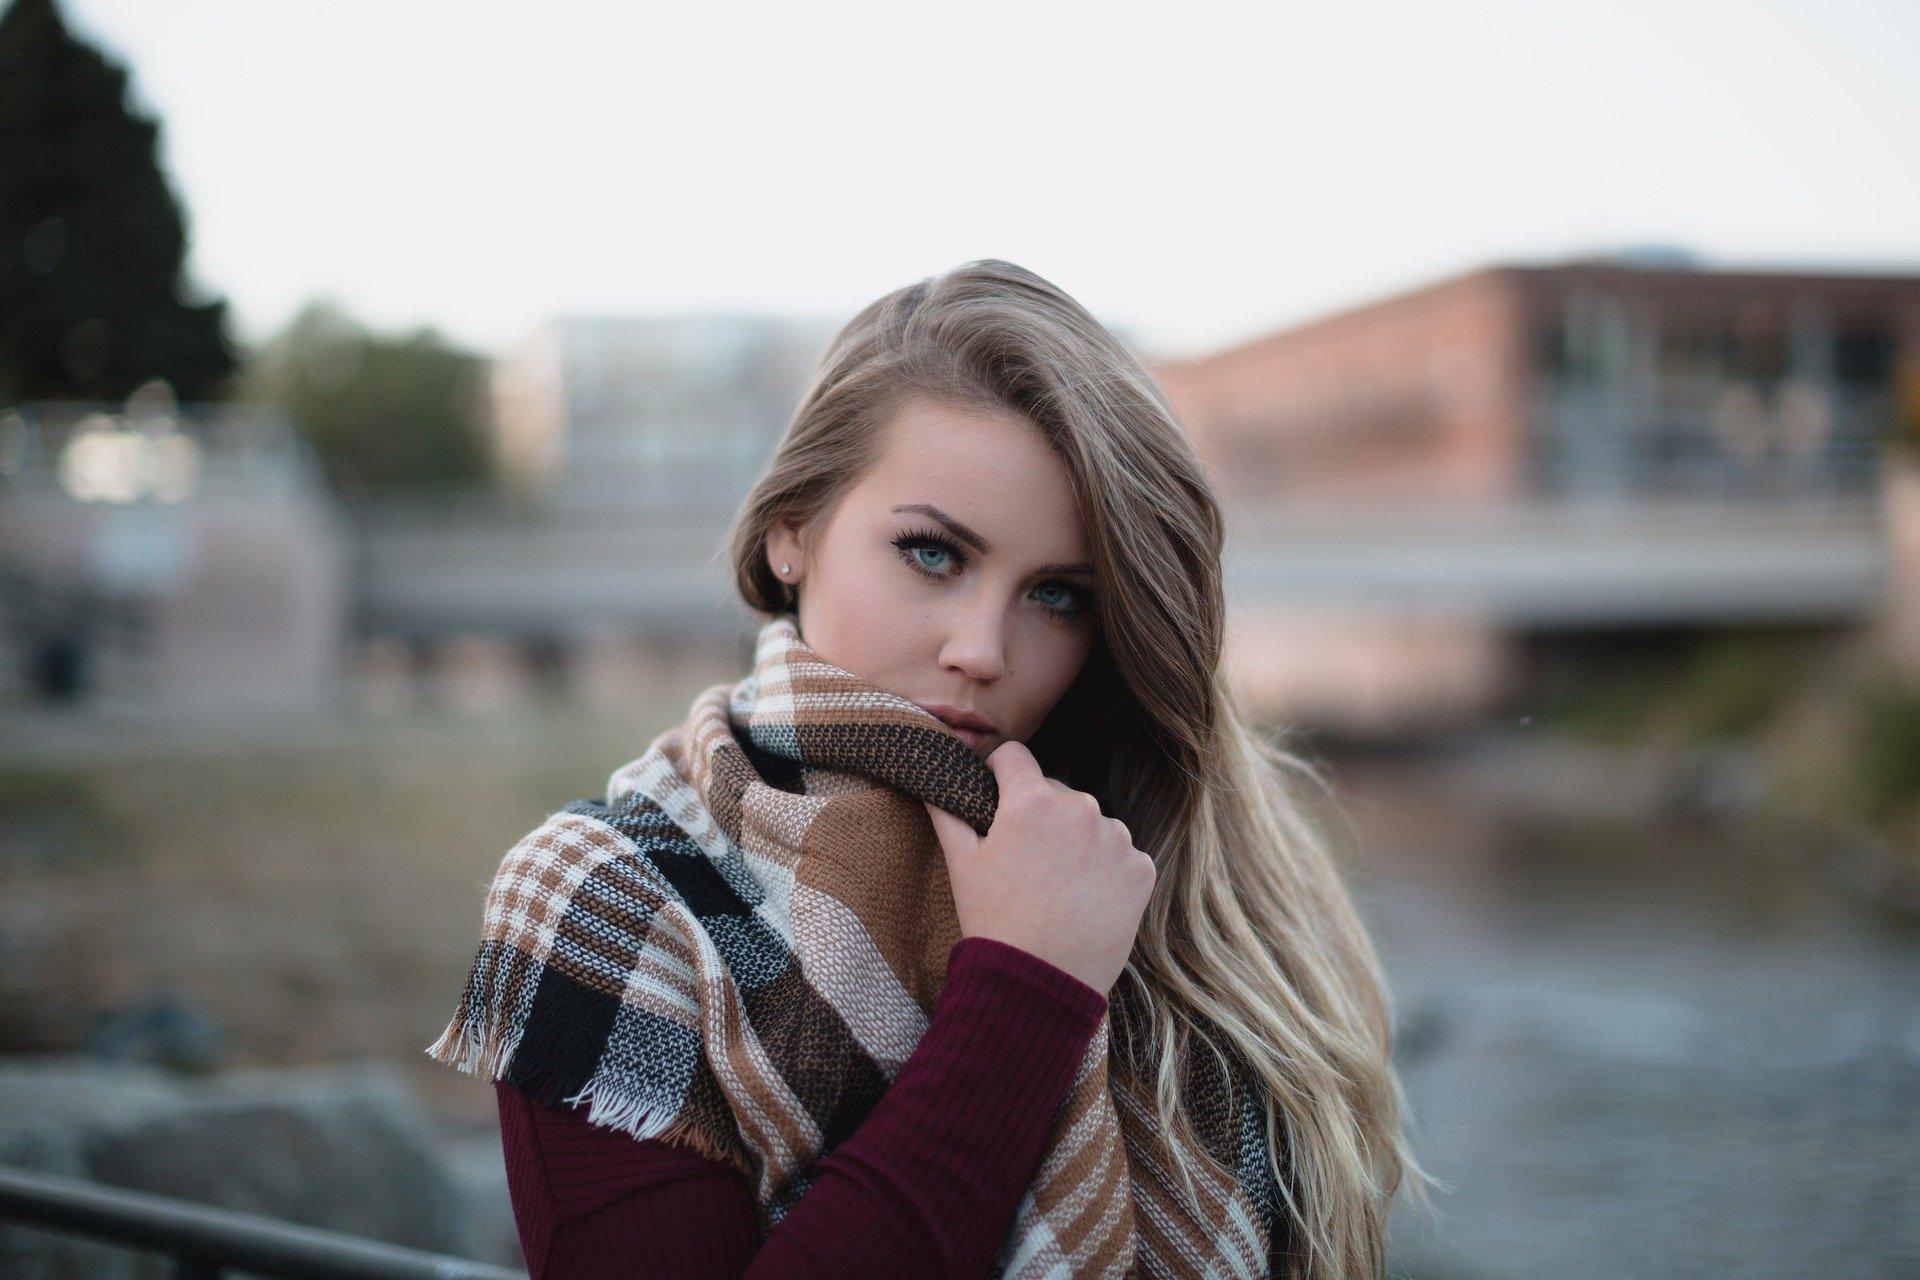 Blonde Woman Model Cold Fashion Female Girl